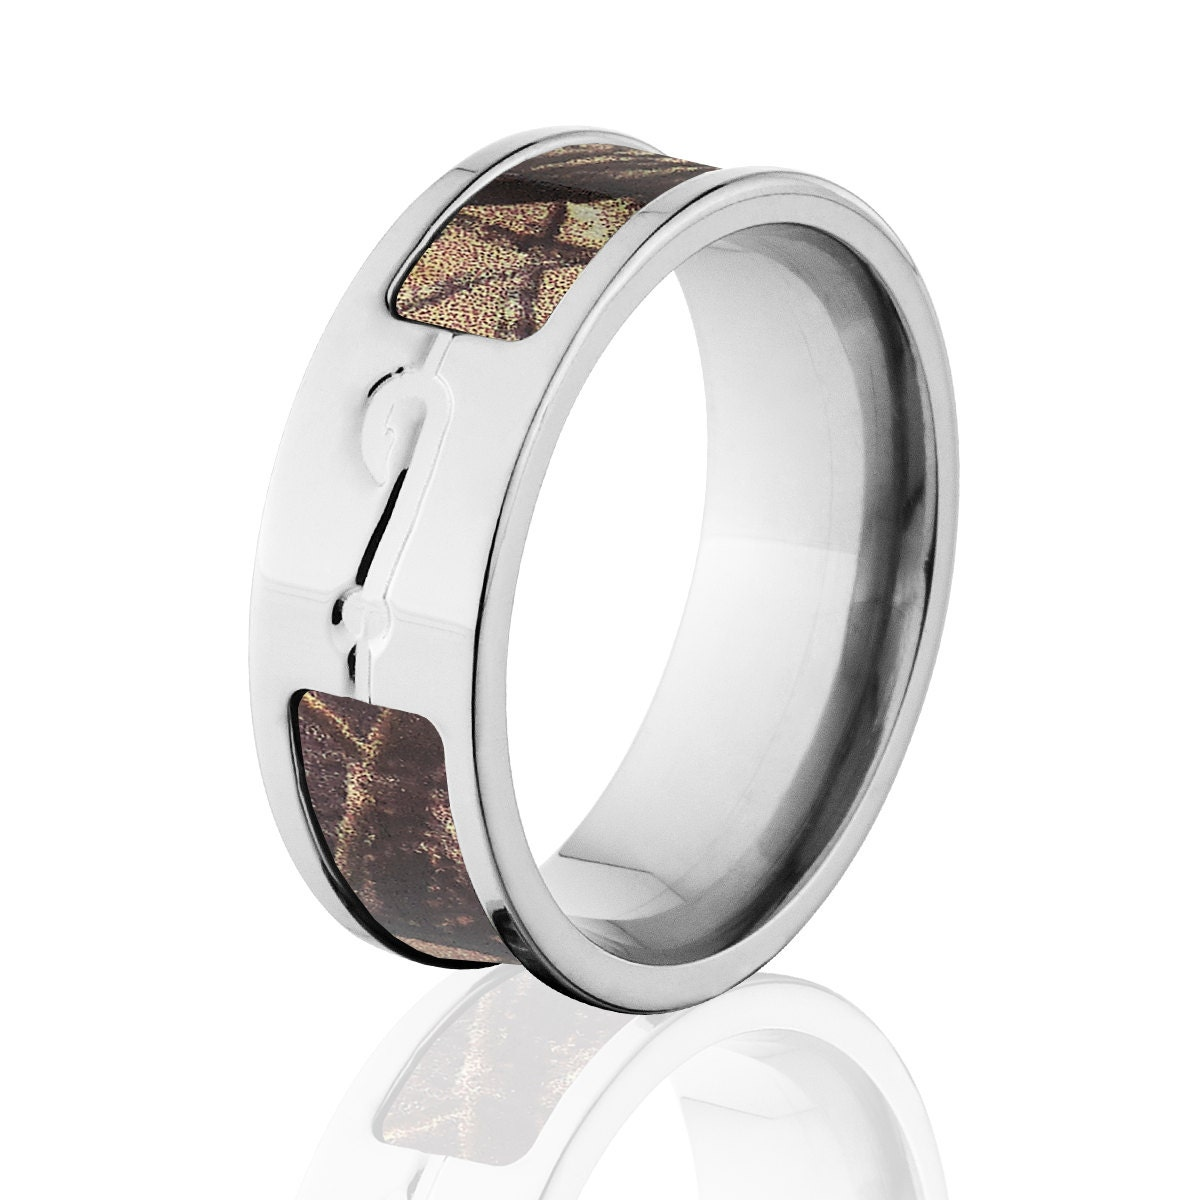 Realtree Wedding Rings: AP Camo Rings RealTree Camo Rings Camo Wedding Bands